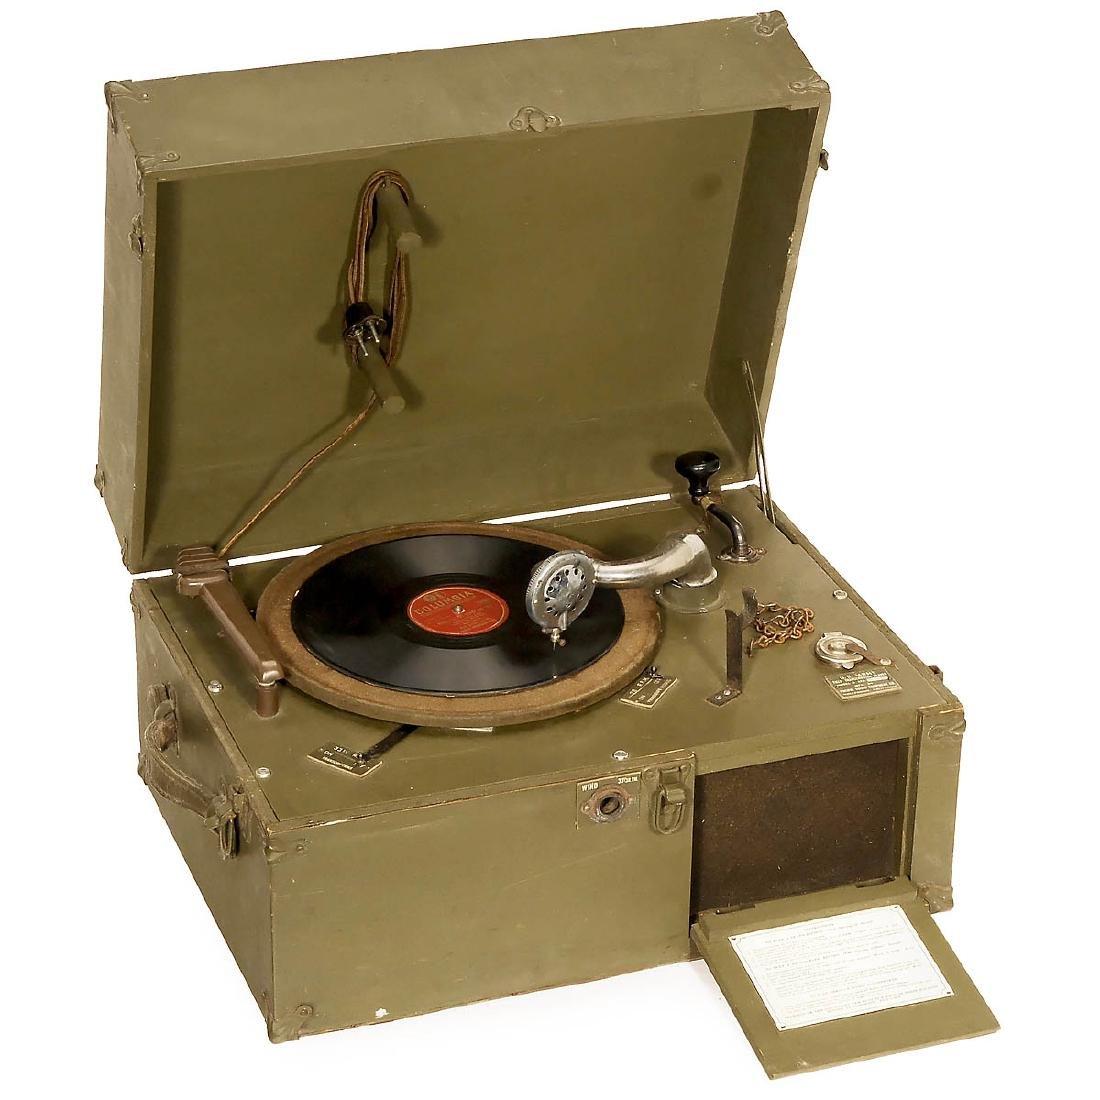 U.S. Army Field Gramophone, c. 1942